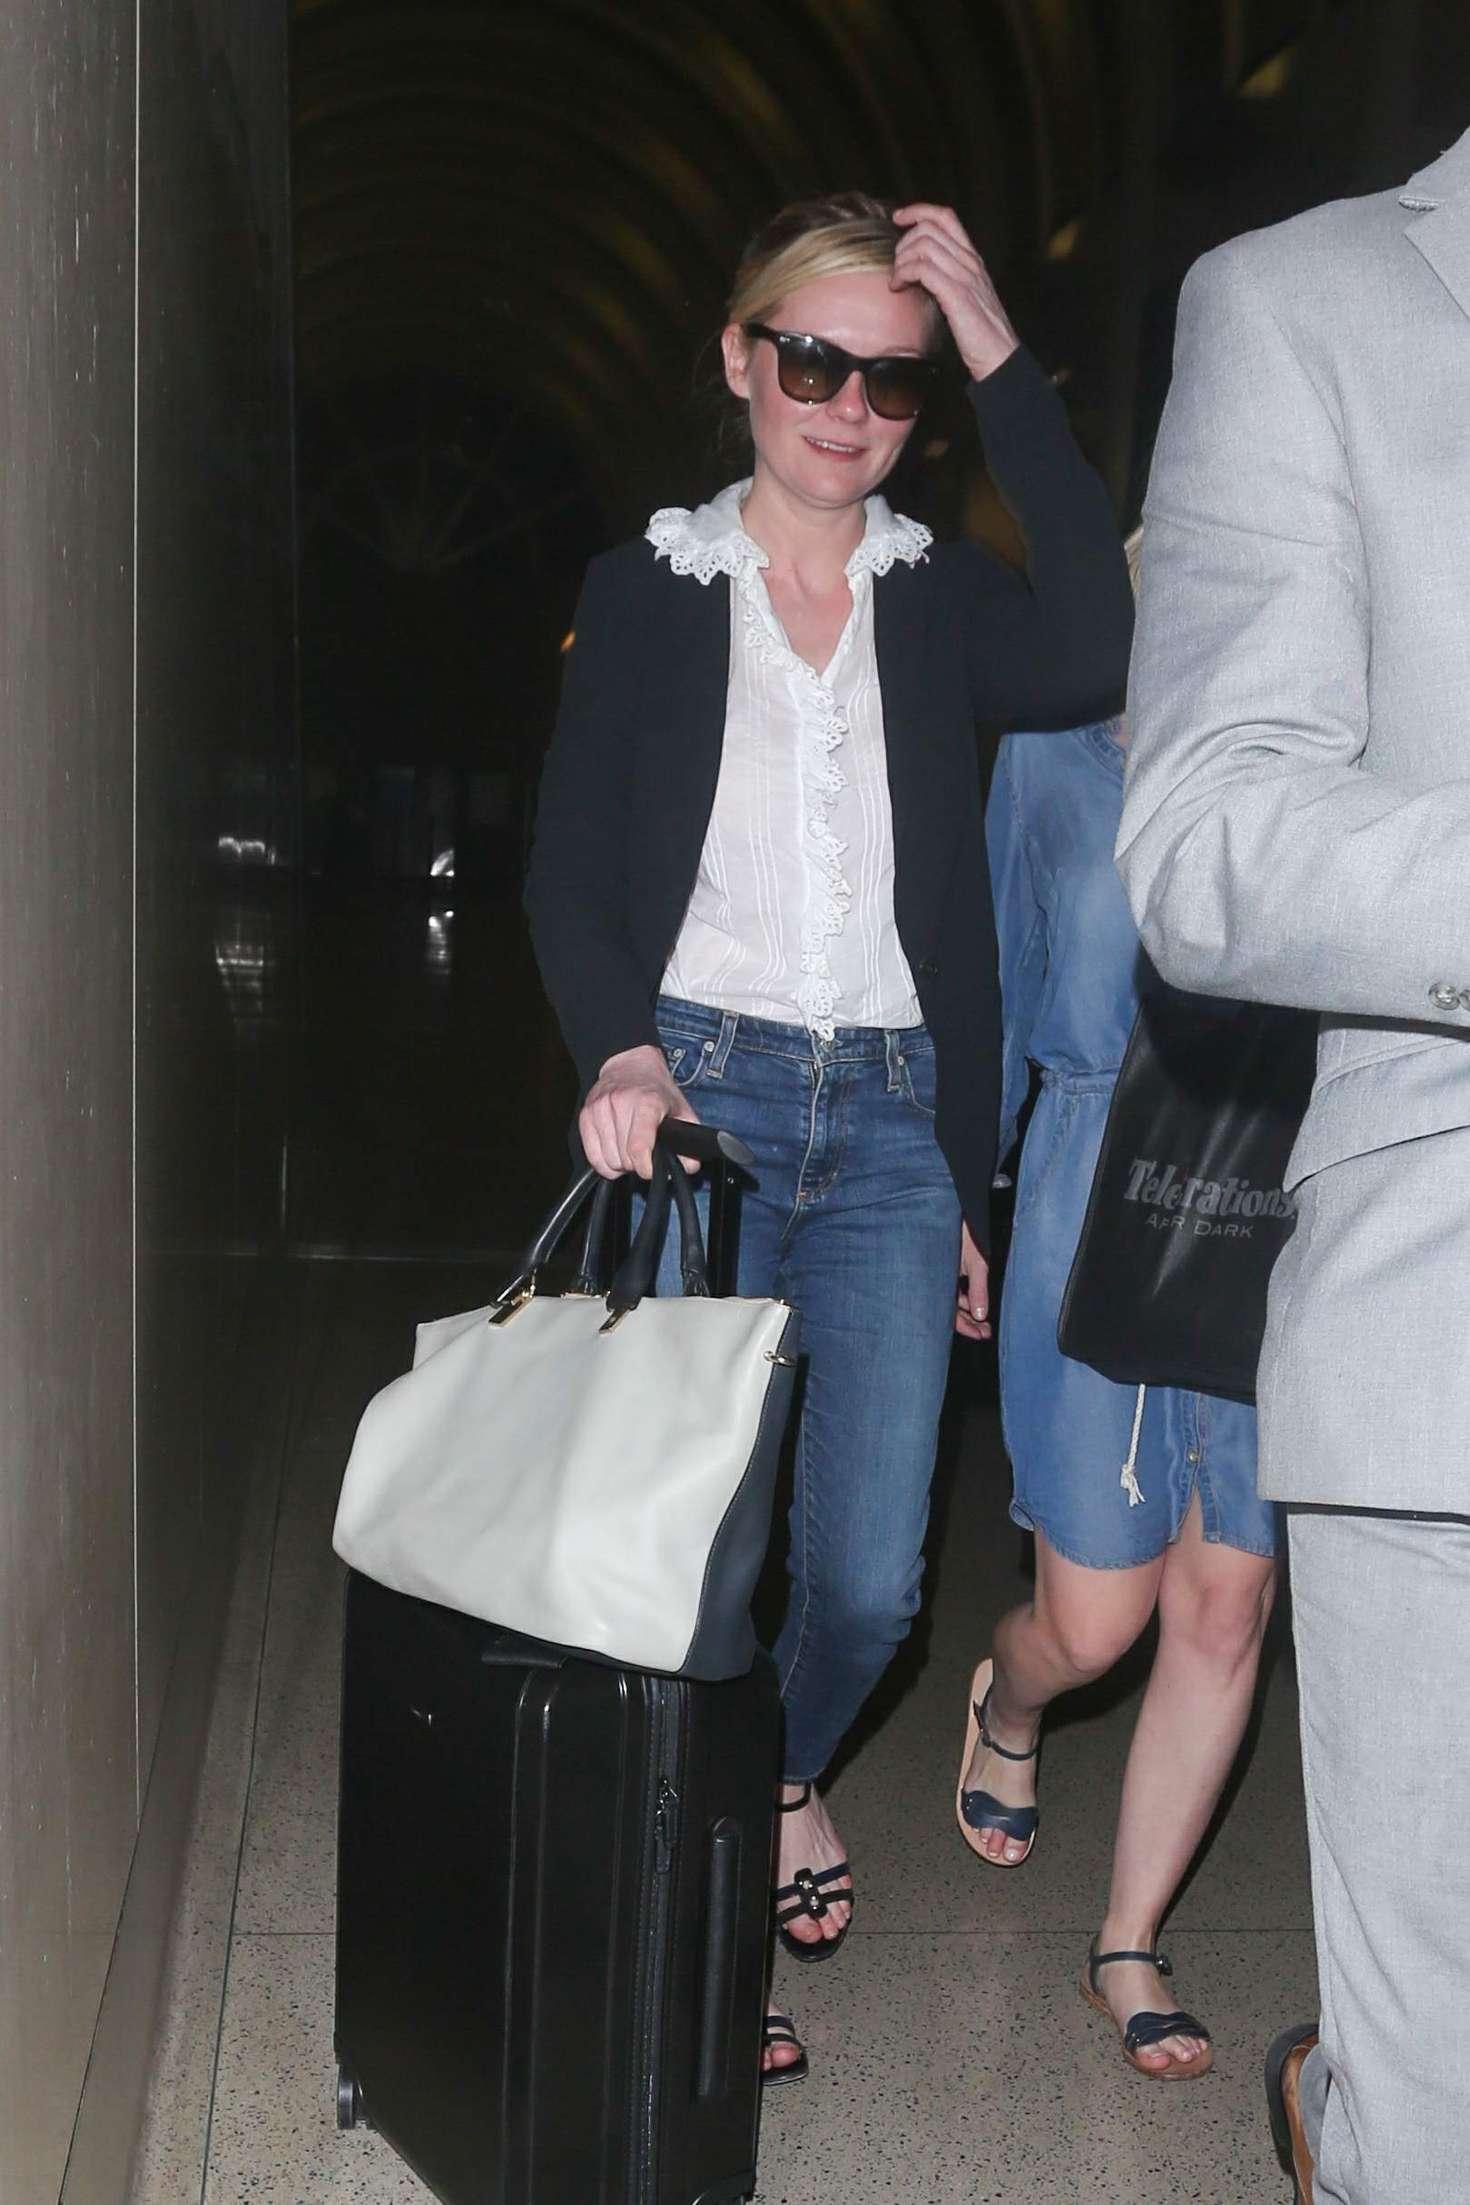 Kirsten Dunst 2016 : Kirsten Dunst at LAX Airport -06